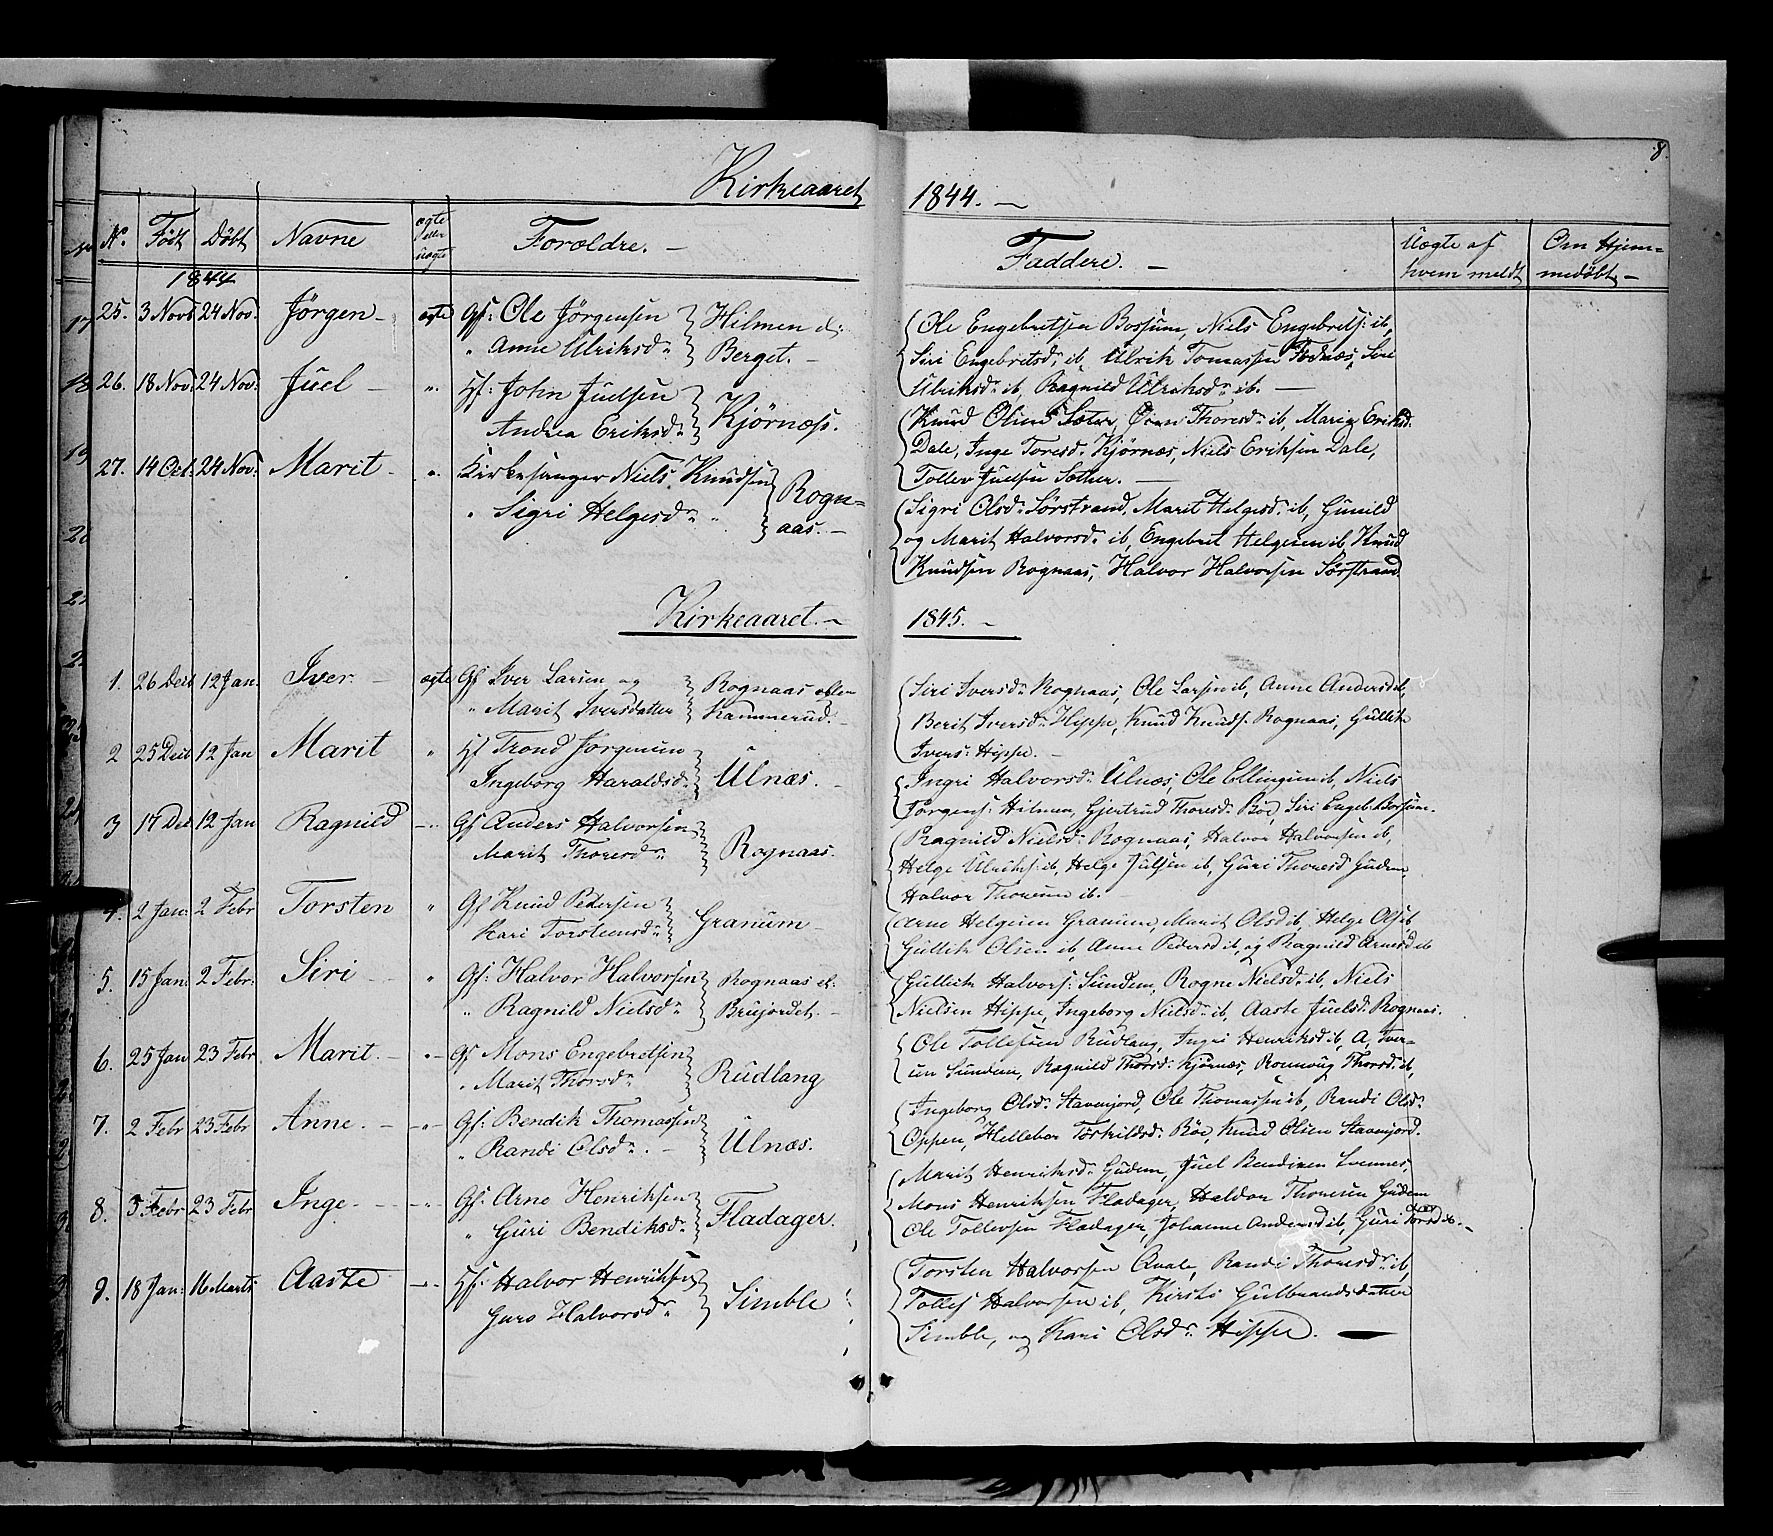 SAH, Nord-Aurdal prestekontor, Ministerialbok nr. 6, 1842-1863, s. 8